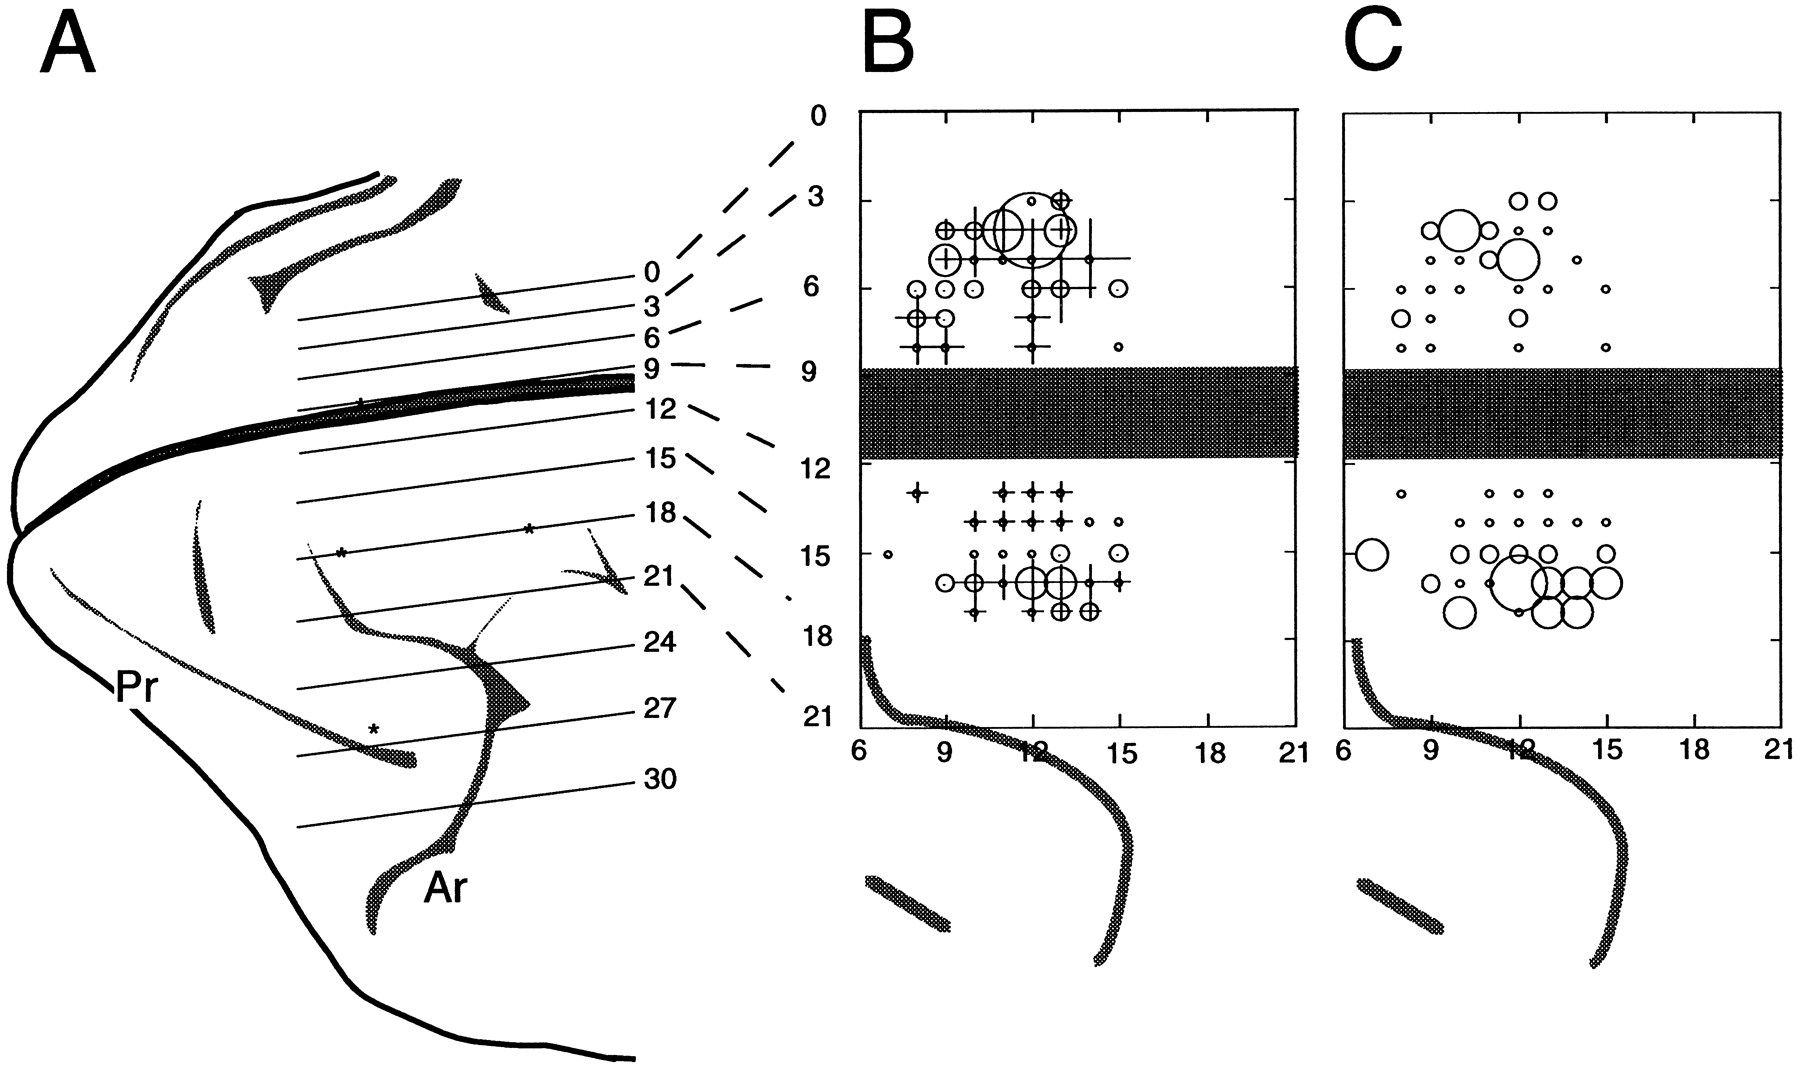 wiring diagram gillig bus blue bird bus diagram wiring